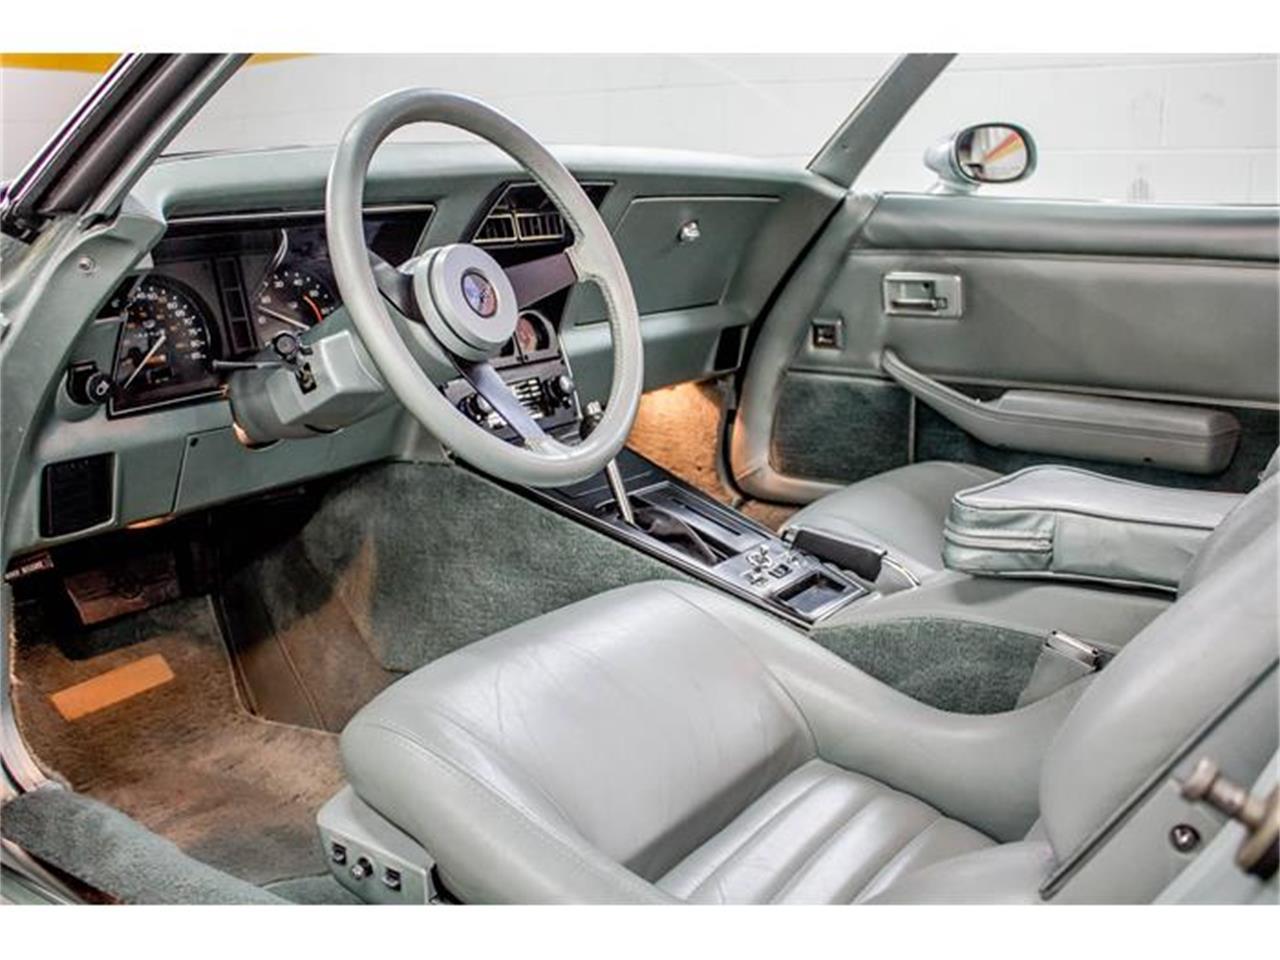 Large Picture of '82 Corvette located in Quebec - $24,900.00 - GE2L